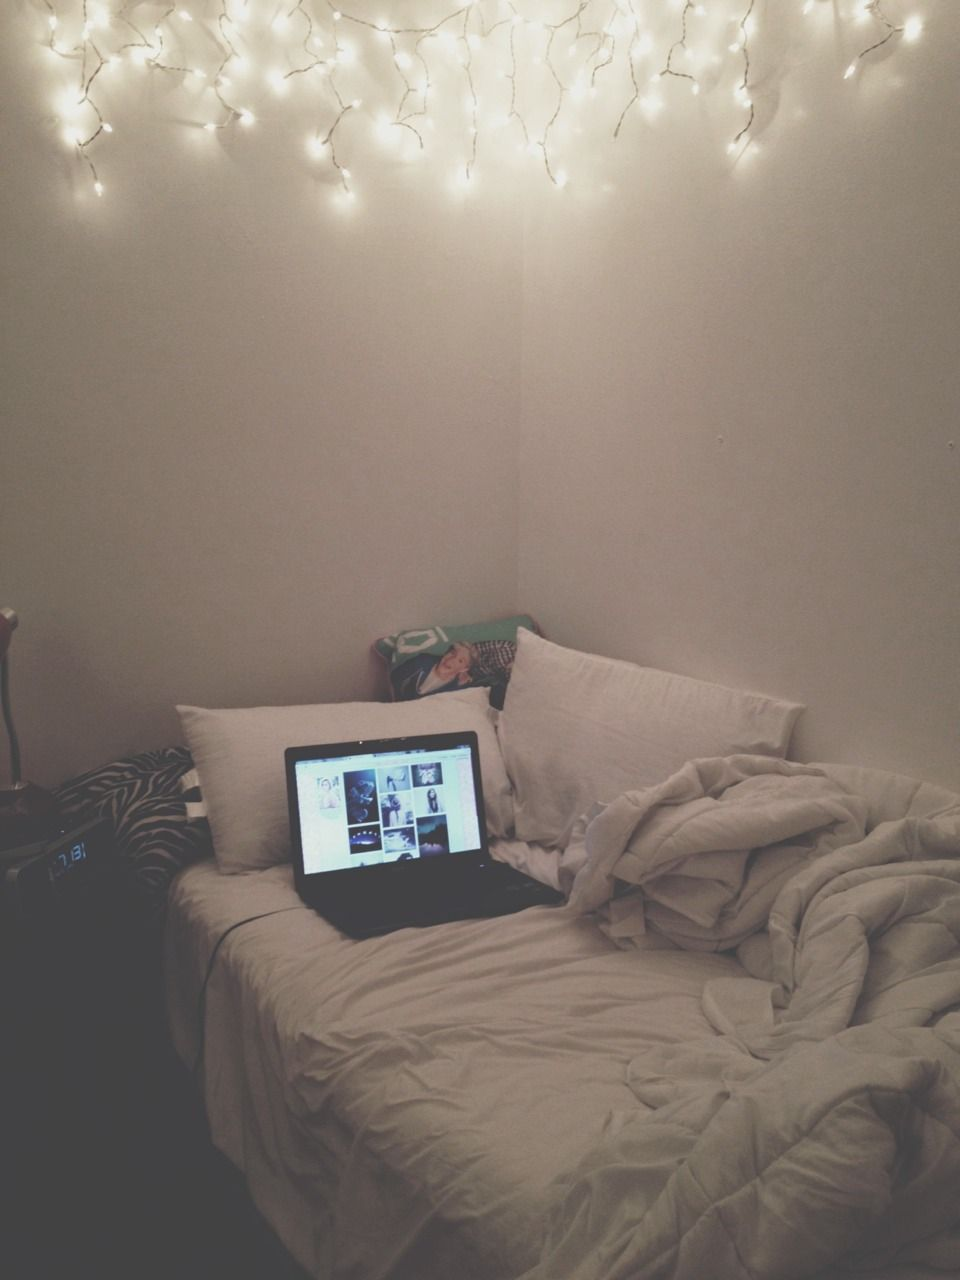 simple bedroom tumblr. Tumblr Bedrooms Simple Bedroom